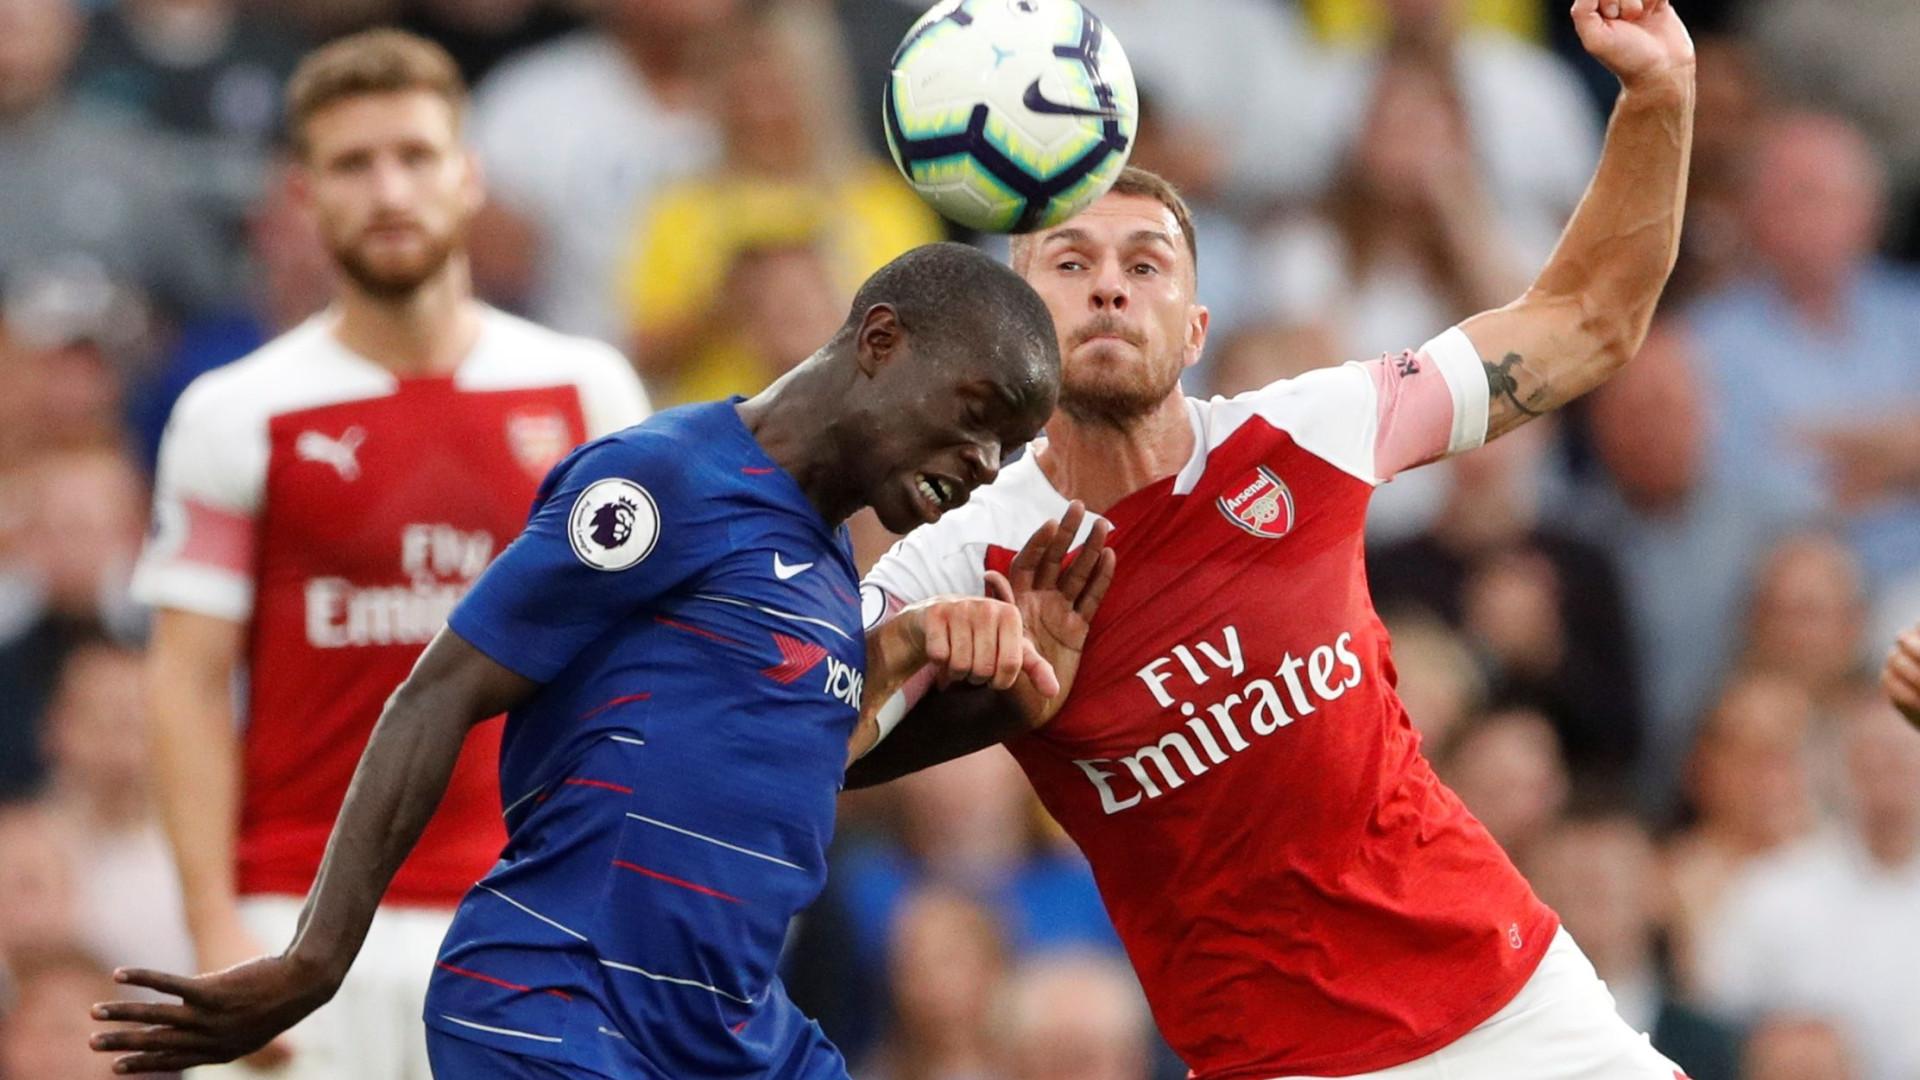 Adepto do Arsenal encontra Kanté na rua. Jogador pediu-lhe desculpa